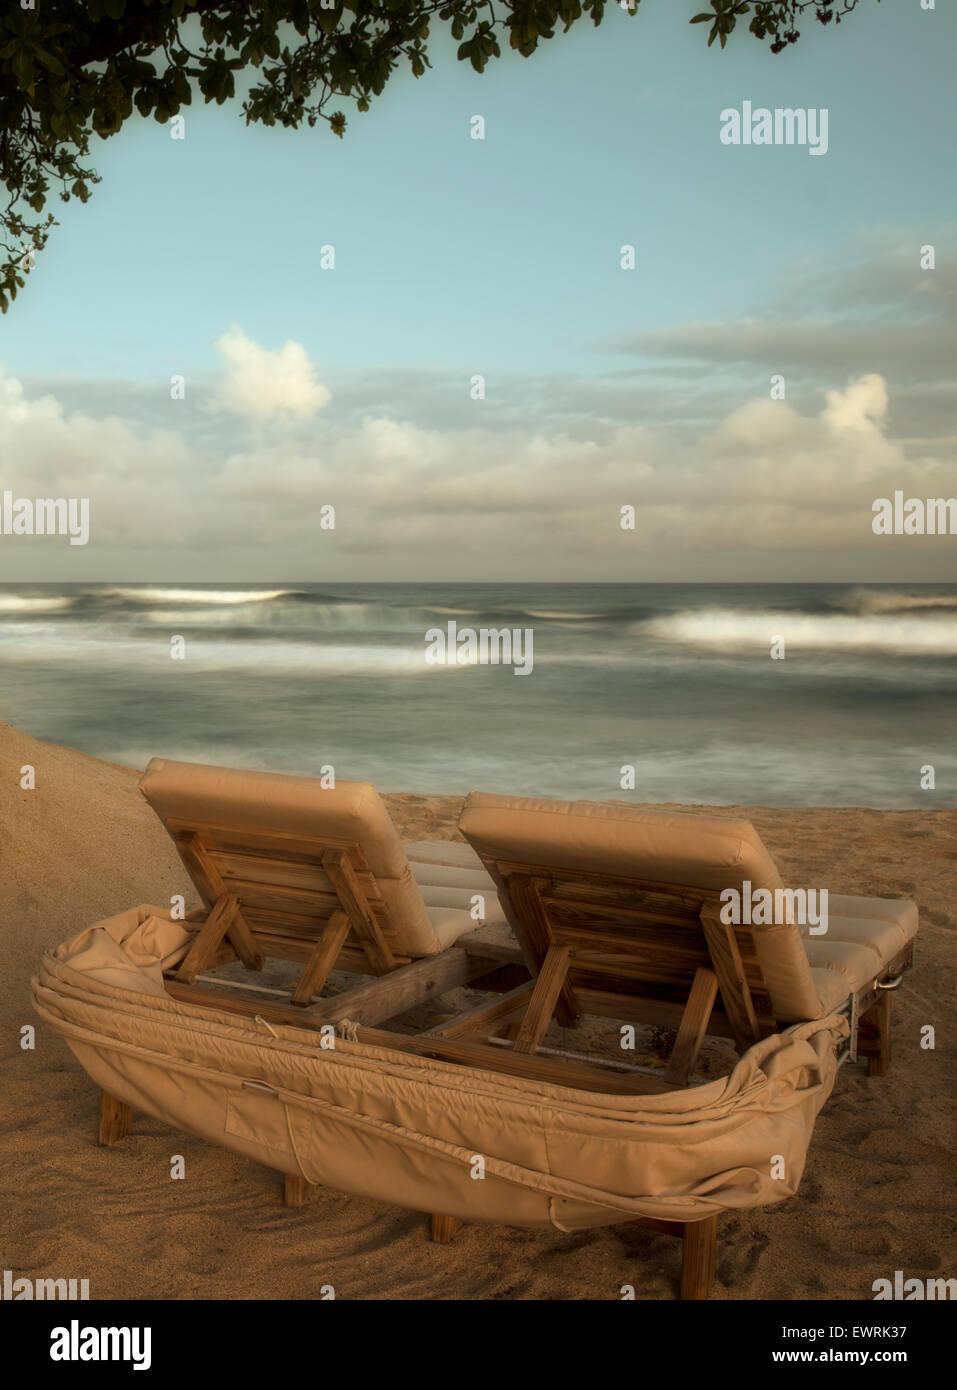 Moon setting over ocean with beach chairs. Hawaii, The big Island. - Stock Image